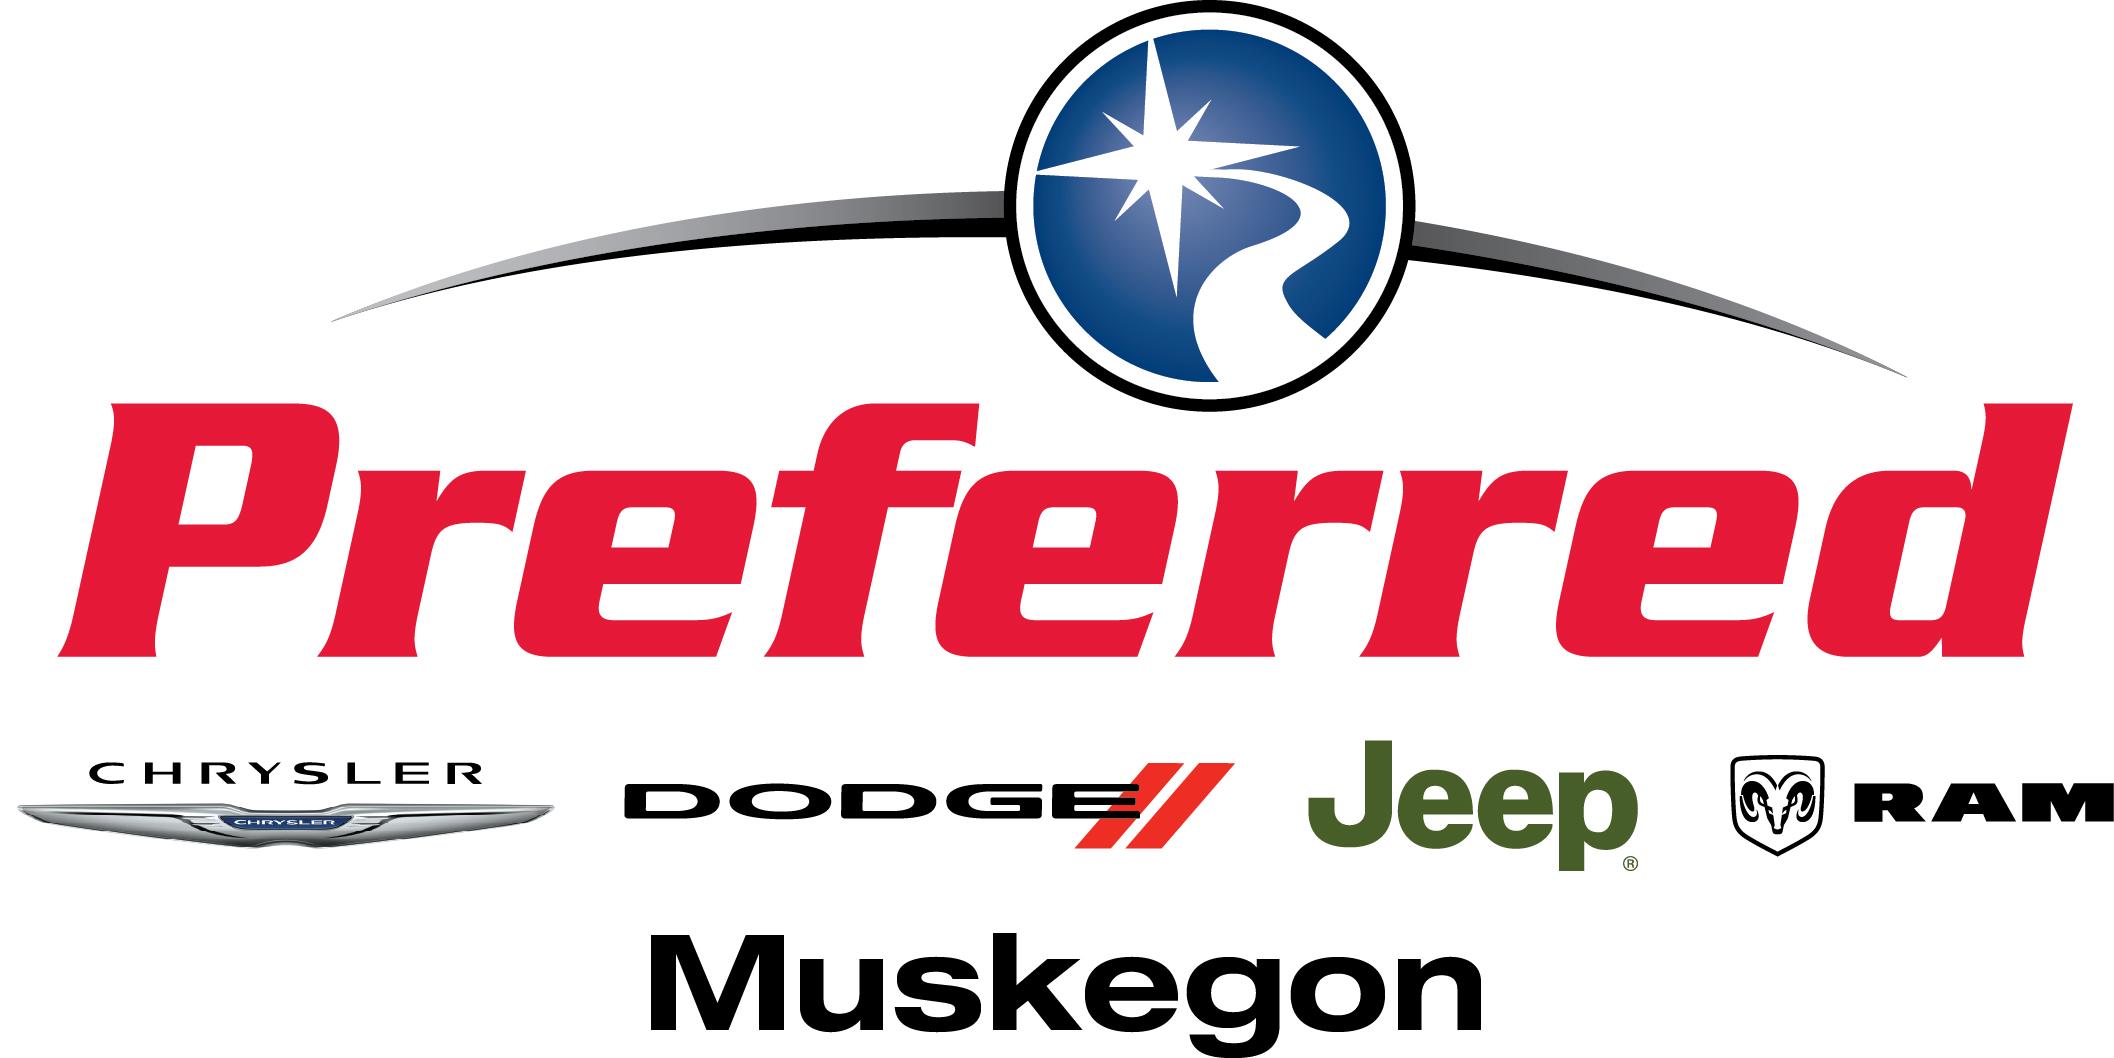 Preferred Chrysler Dodge Jeep Ram